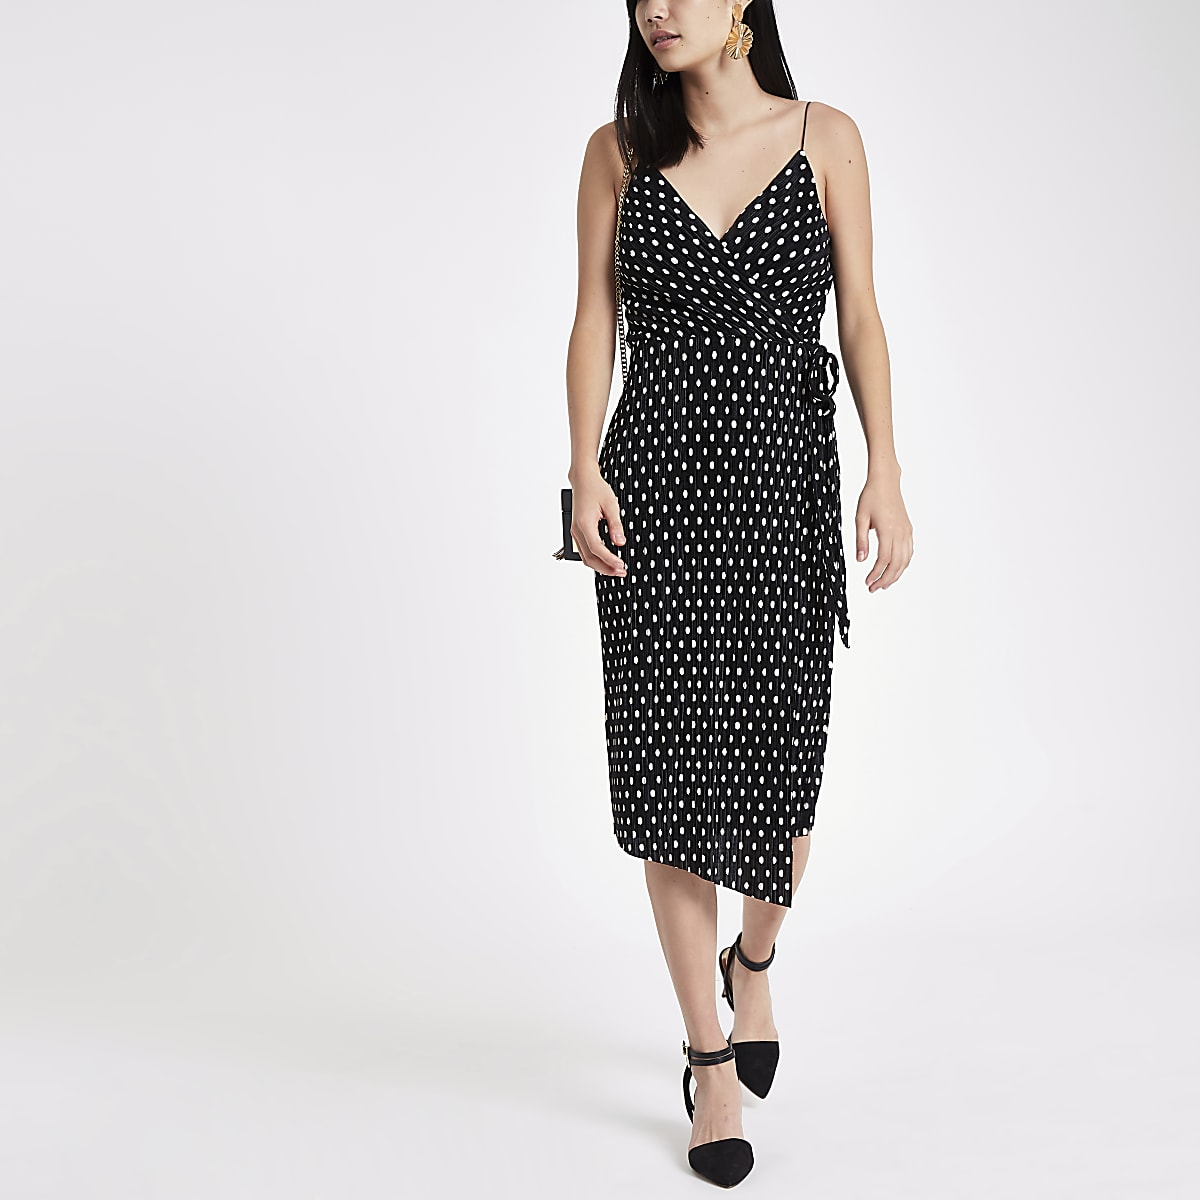 3a2f945c8948 Black plisse spot wrap midi slip dress - Slip & Cami Dresses ...